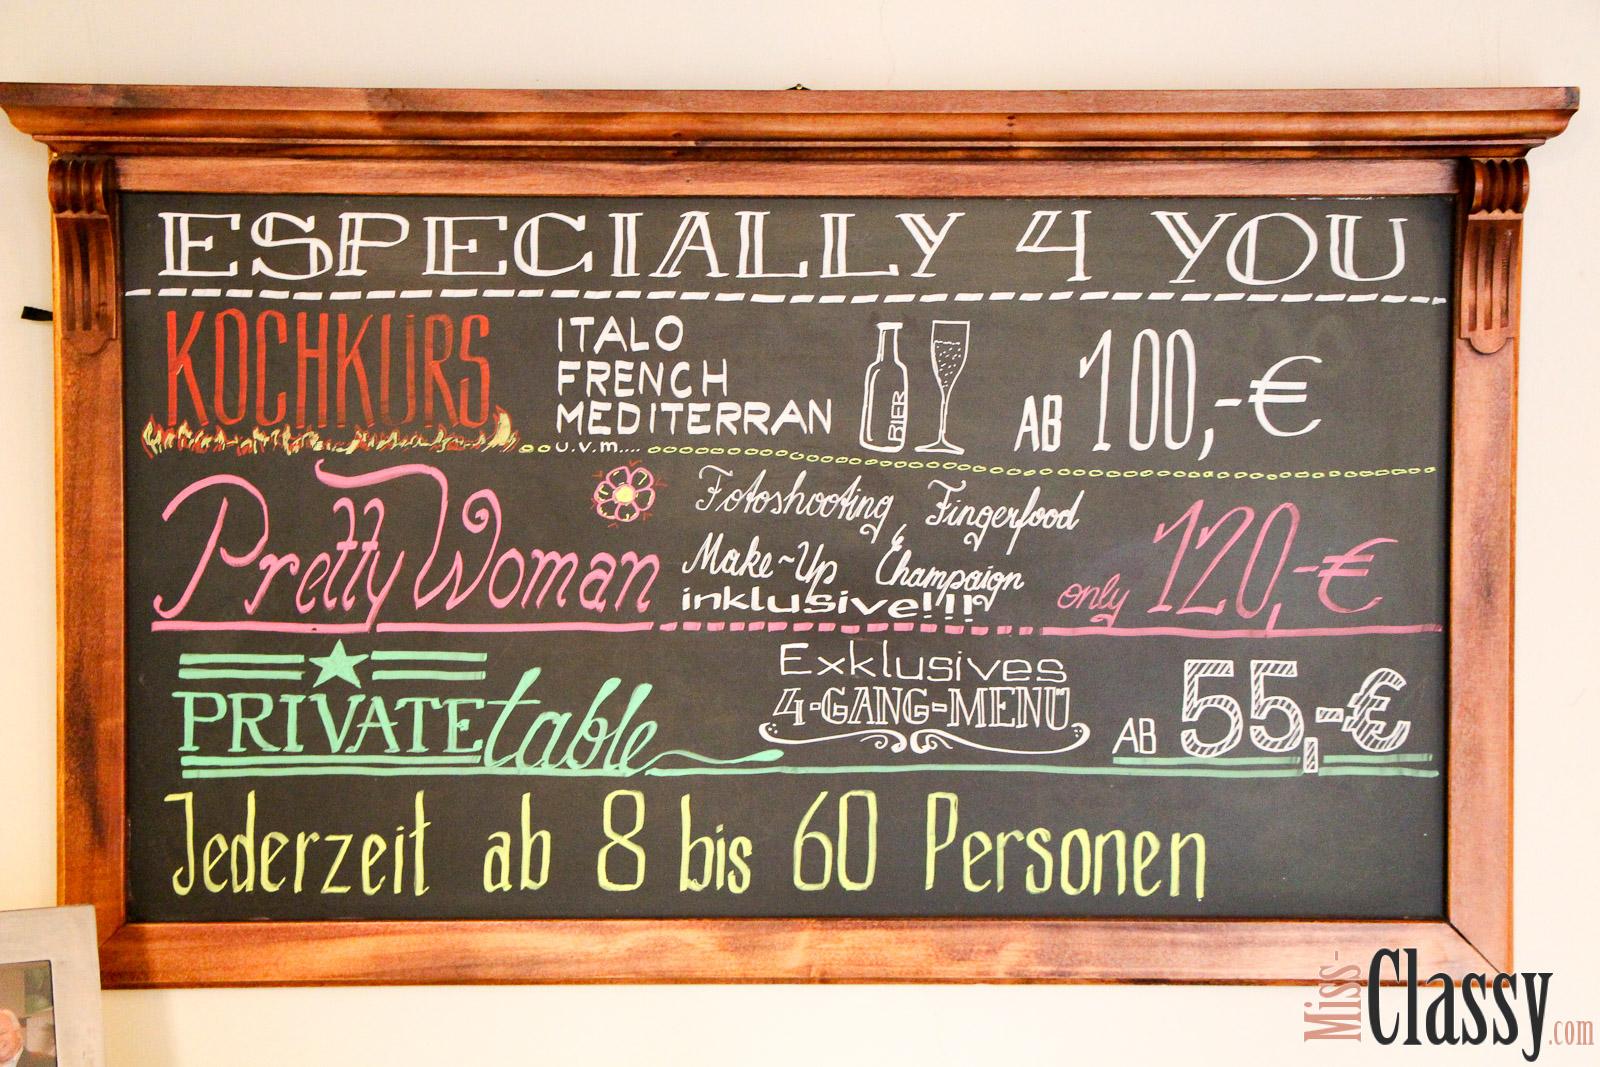 LIFESTYLE Candle Light Dinner in der Kitchen 12, Miss Classy, Doris, miss-classy, miss-classy.com. Lifestyleblog, Lifestyleblogger, Lifestyle, Lifestyleblog Graz, Graz, Steiermark, Österreich, Austria, Foodblog, Foodblogger, Blumendeko, Romantik, Candle Light Dinner, Valentinstag, Valentinstagsdinner, verliebt, Event, Eventlokal, Catering, Kochkurs, 5-Gang Menü